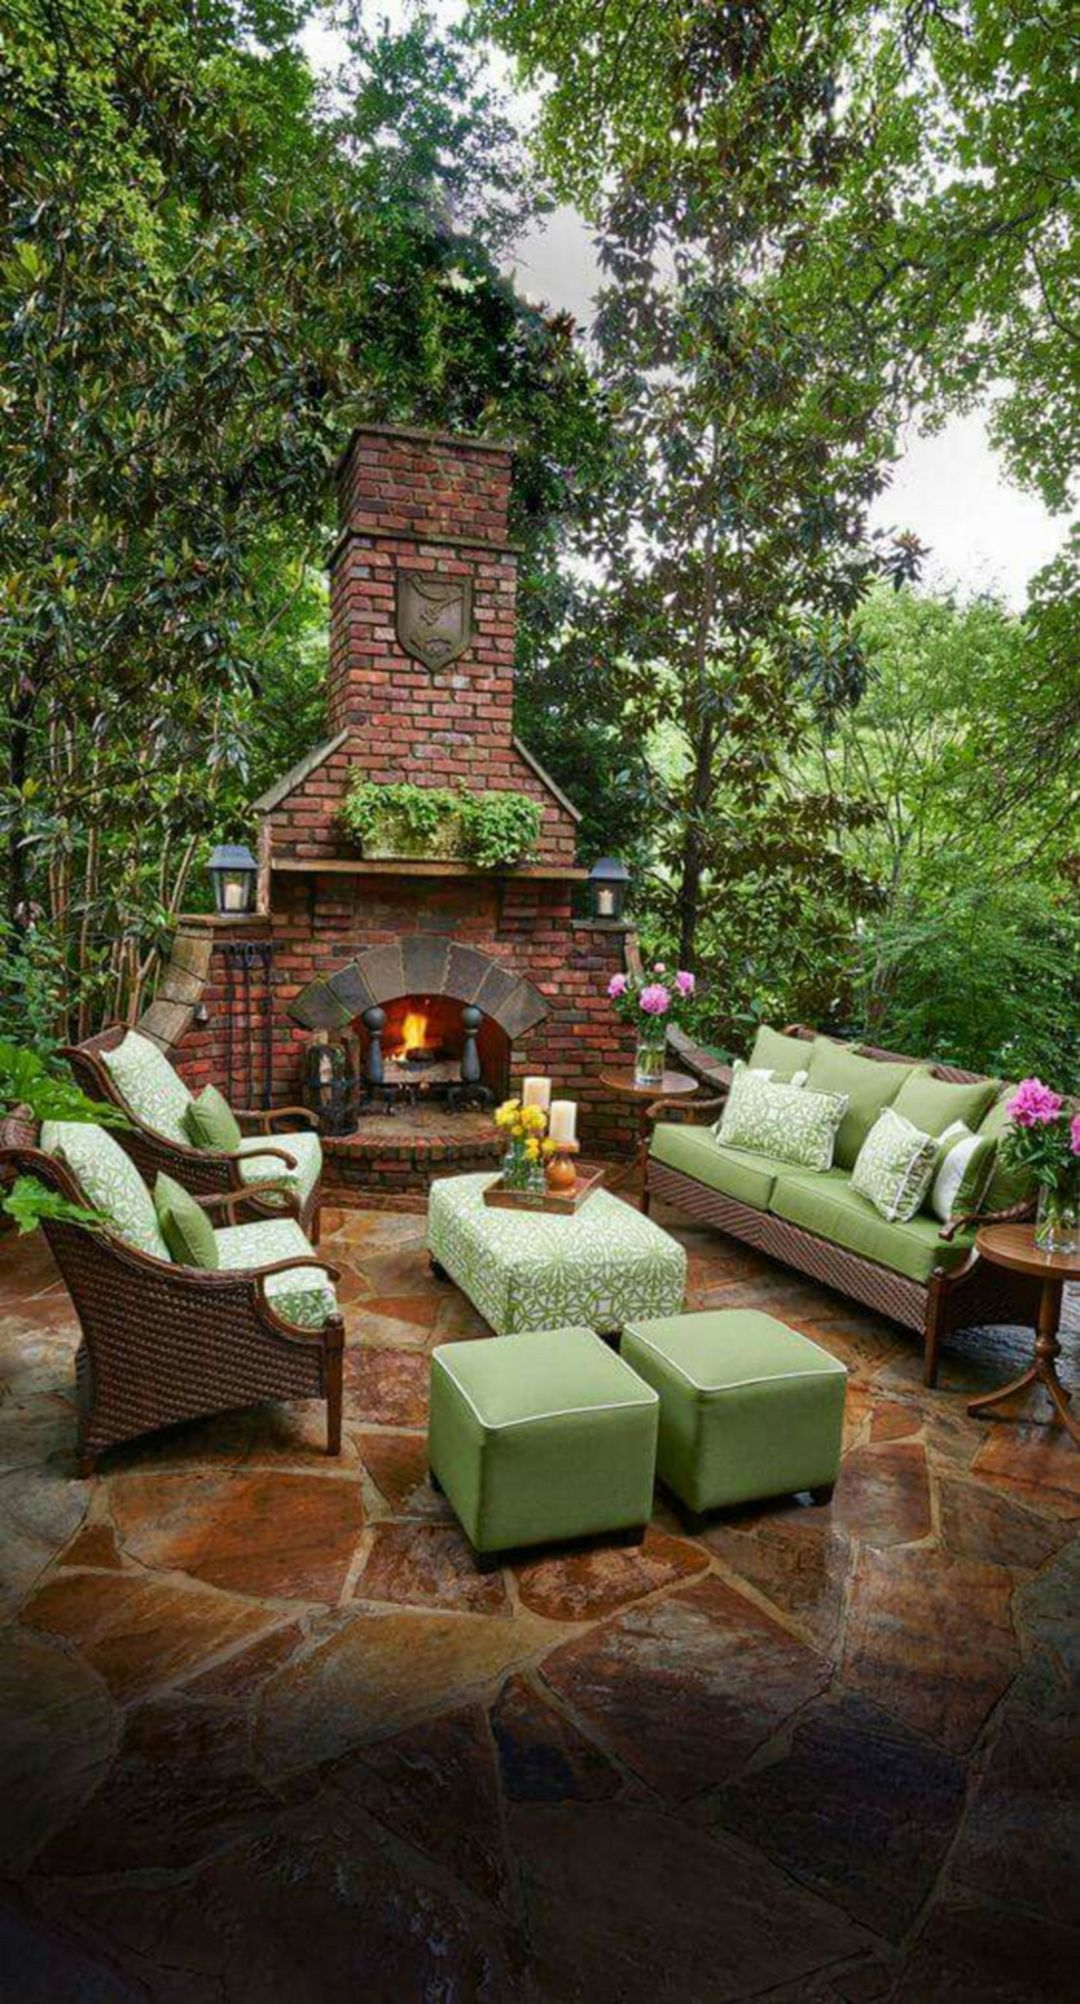 astonshing rustic outdoor fireplace design ideas 687 drau en und h uschen. Black Bedroom Furniture Sets. Home Design Ideas